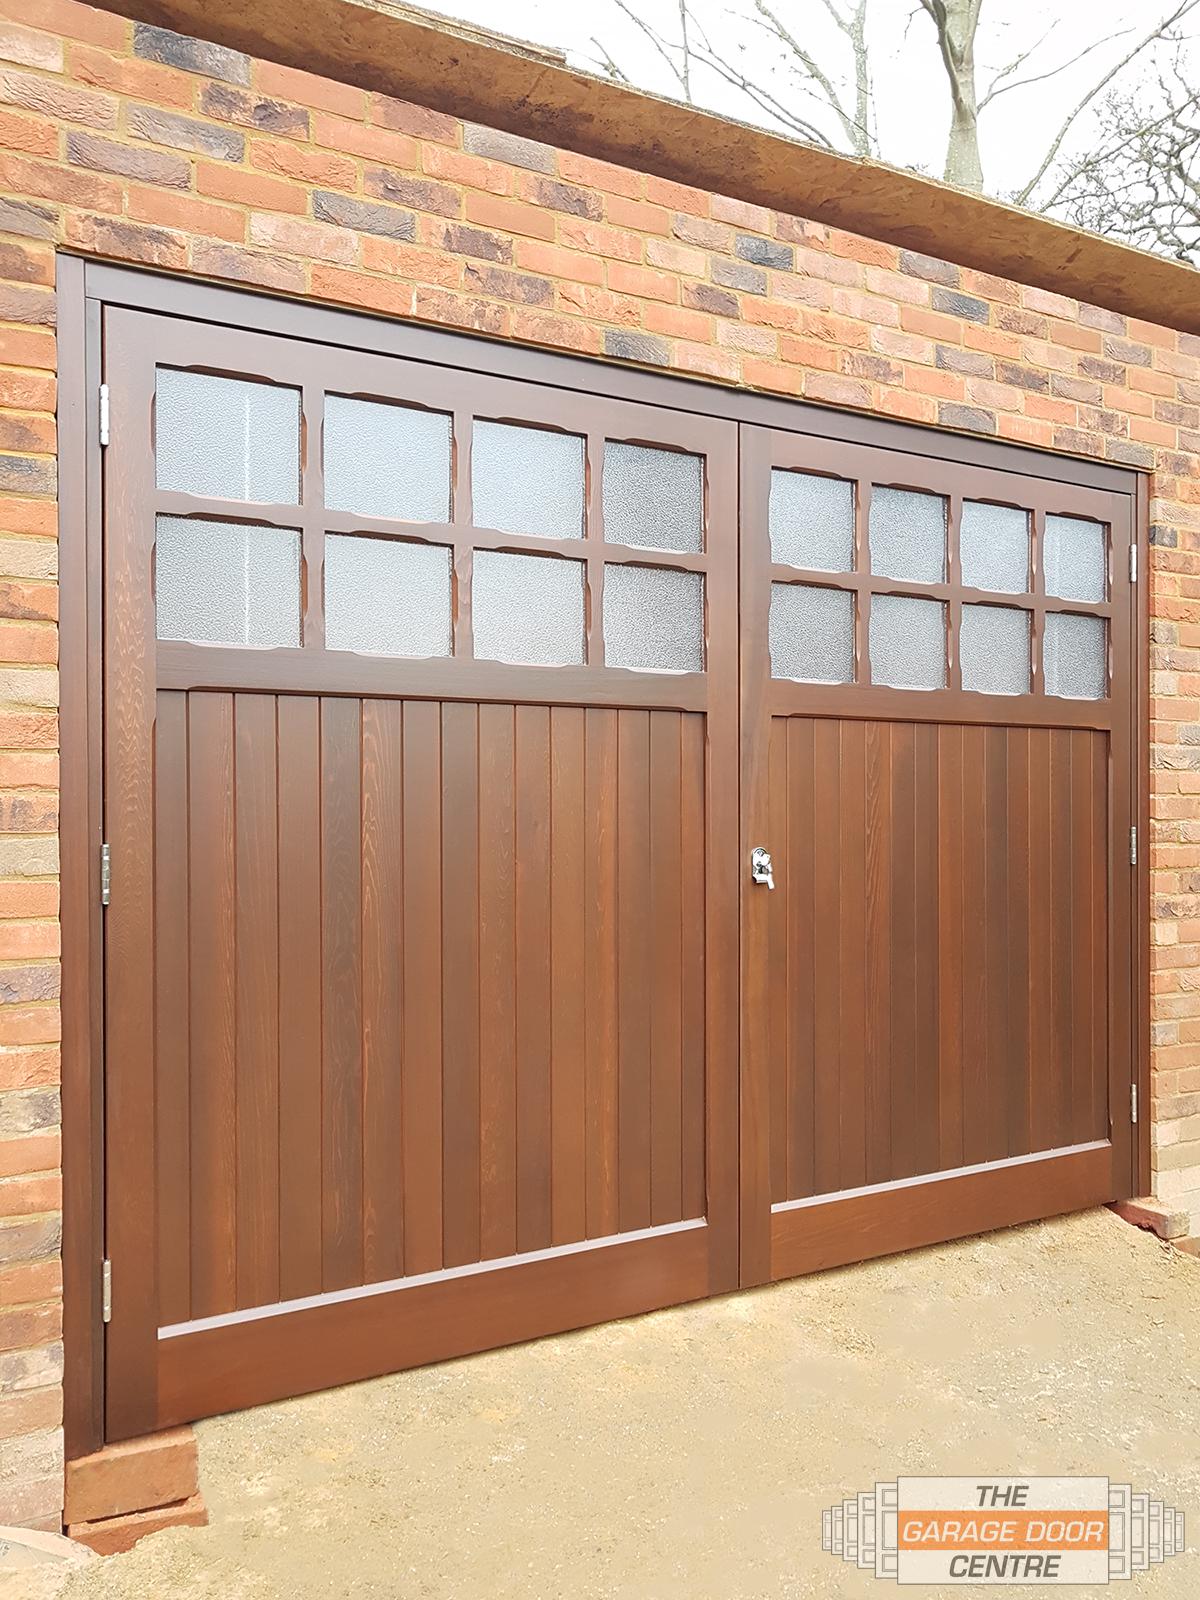 Beautiful Timber Side Hinged Door In 2020 Garage Door Design Side Hinged Garage Doors Garage Door Hinges